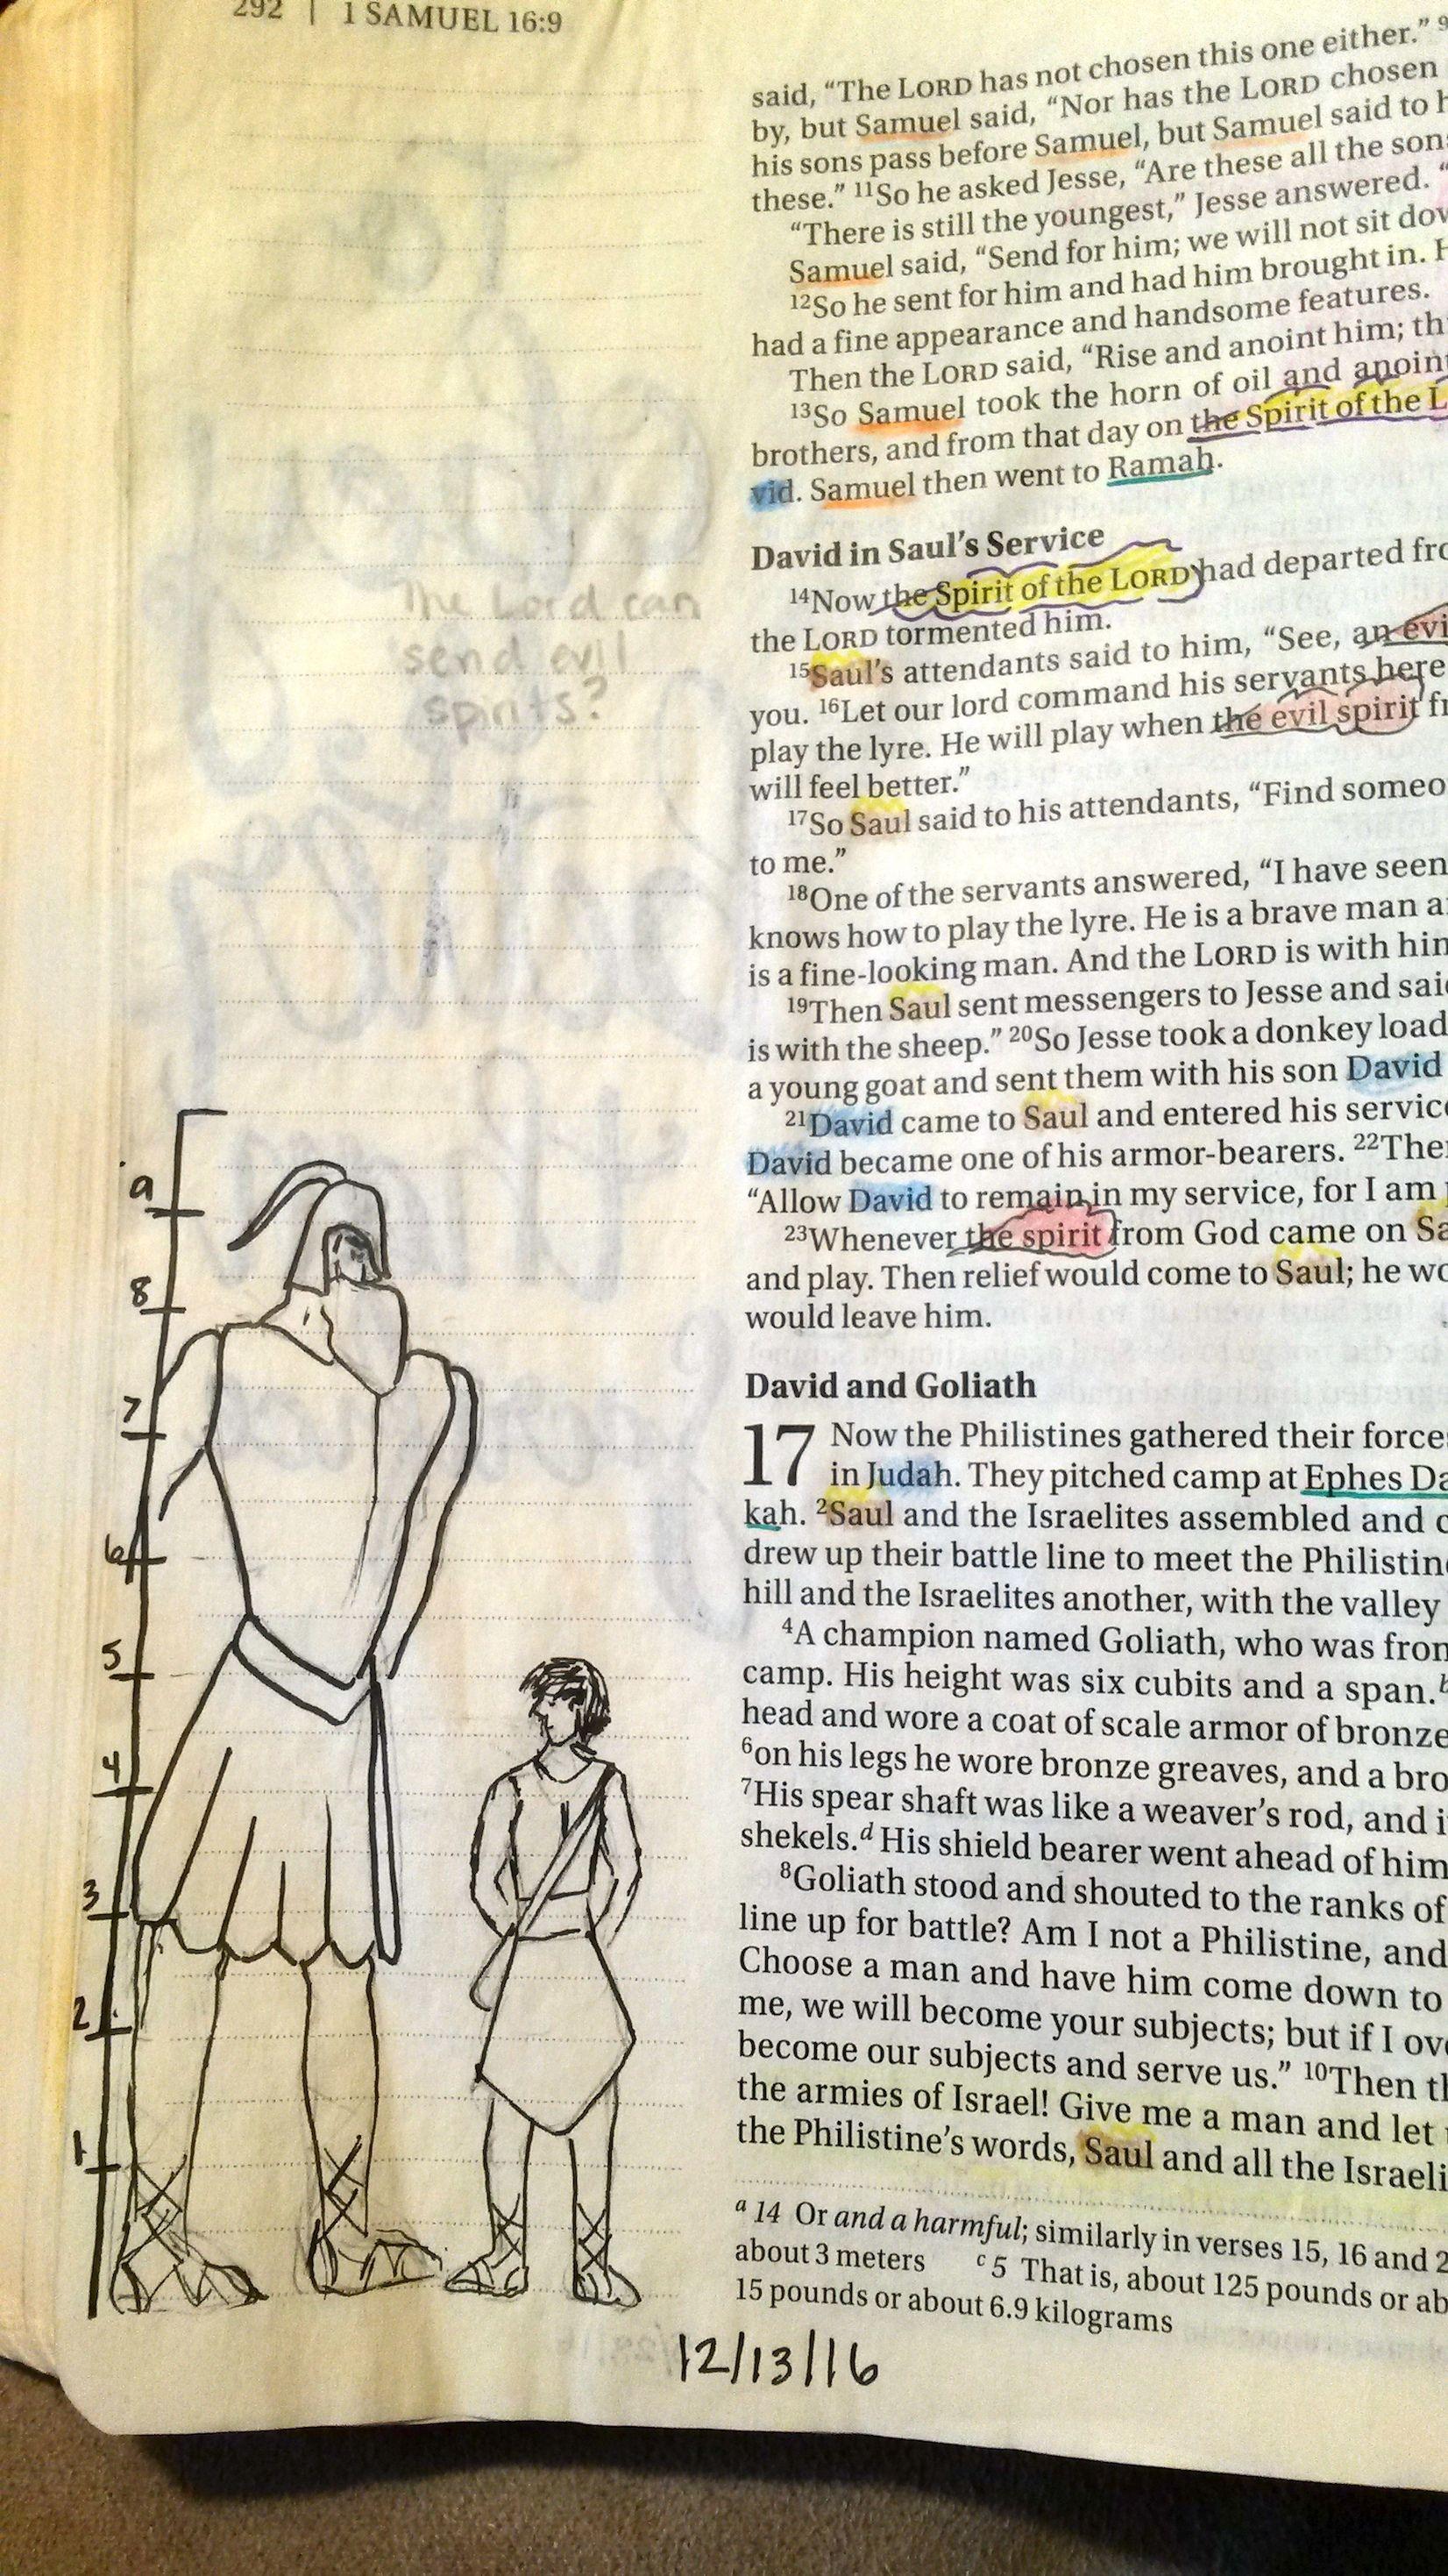 bible journaling 1 samuel 17 david and goliath height bible